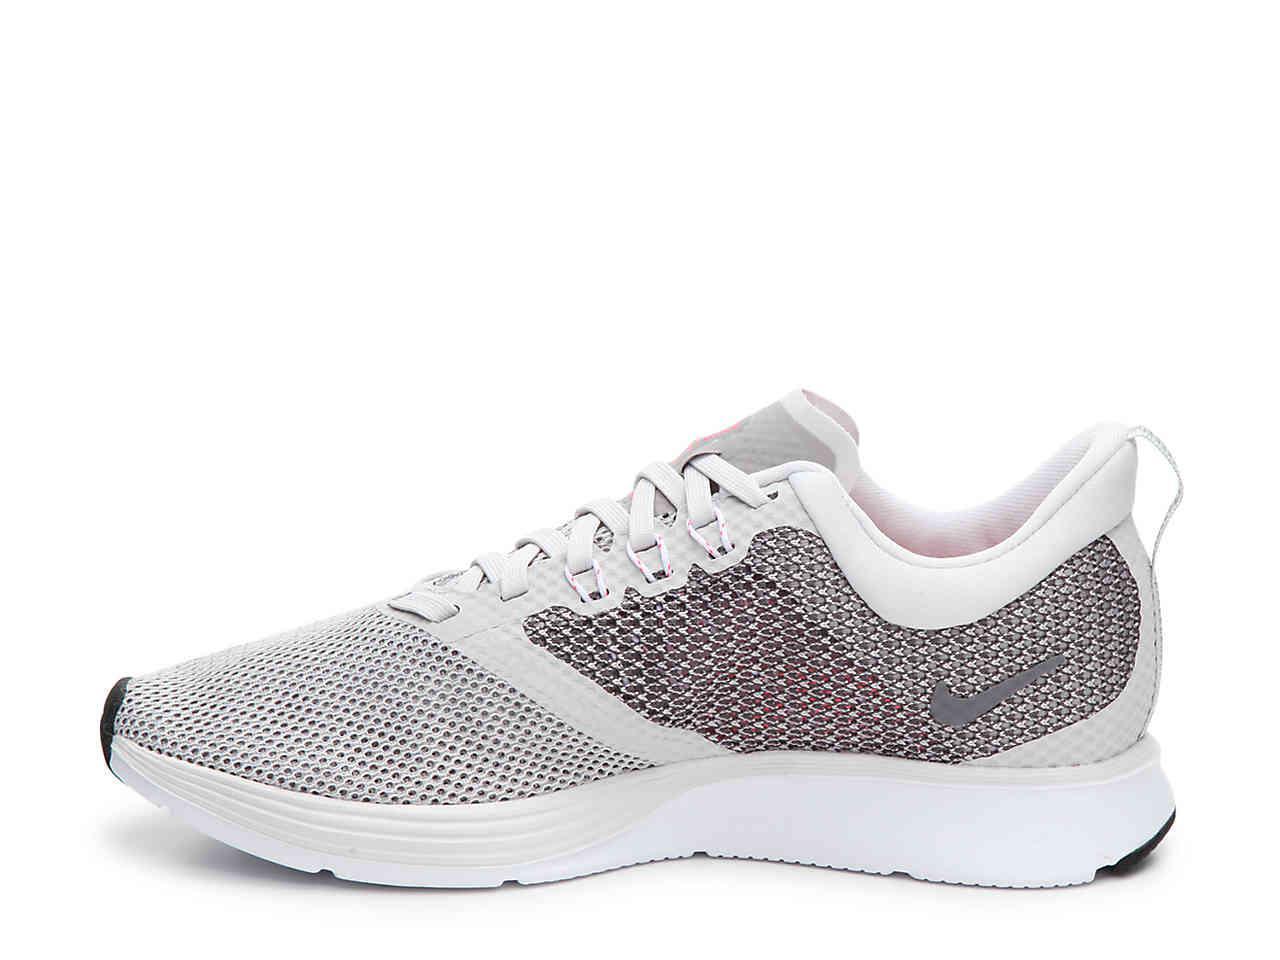 Lyst Nike Zoom Strike Lightweight Running Shoe in Gray for Men